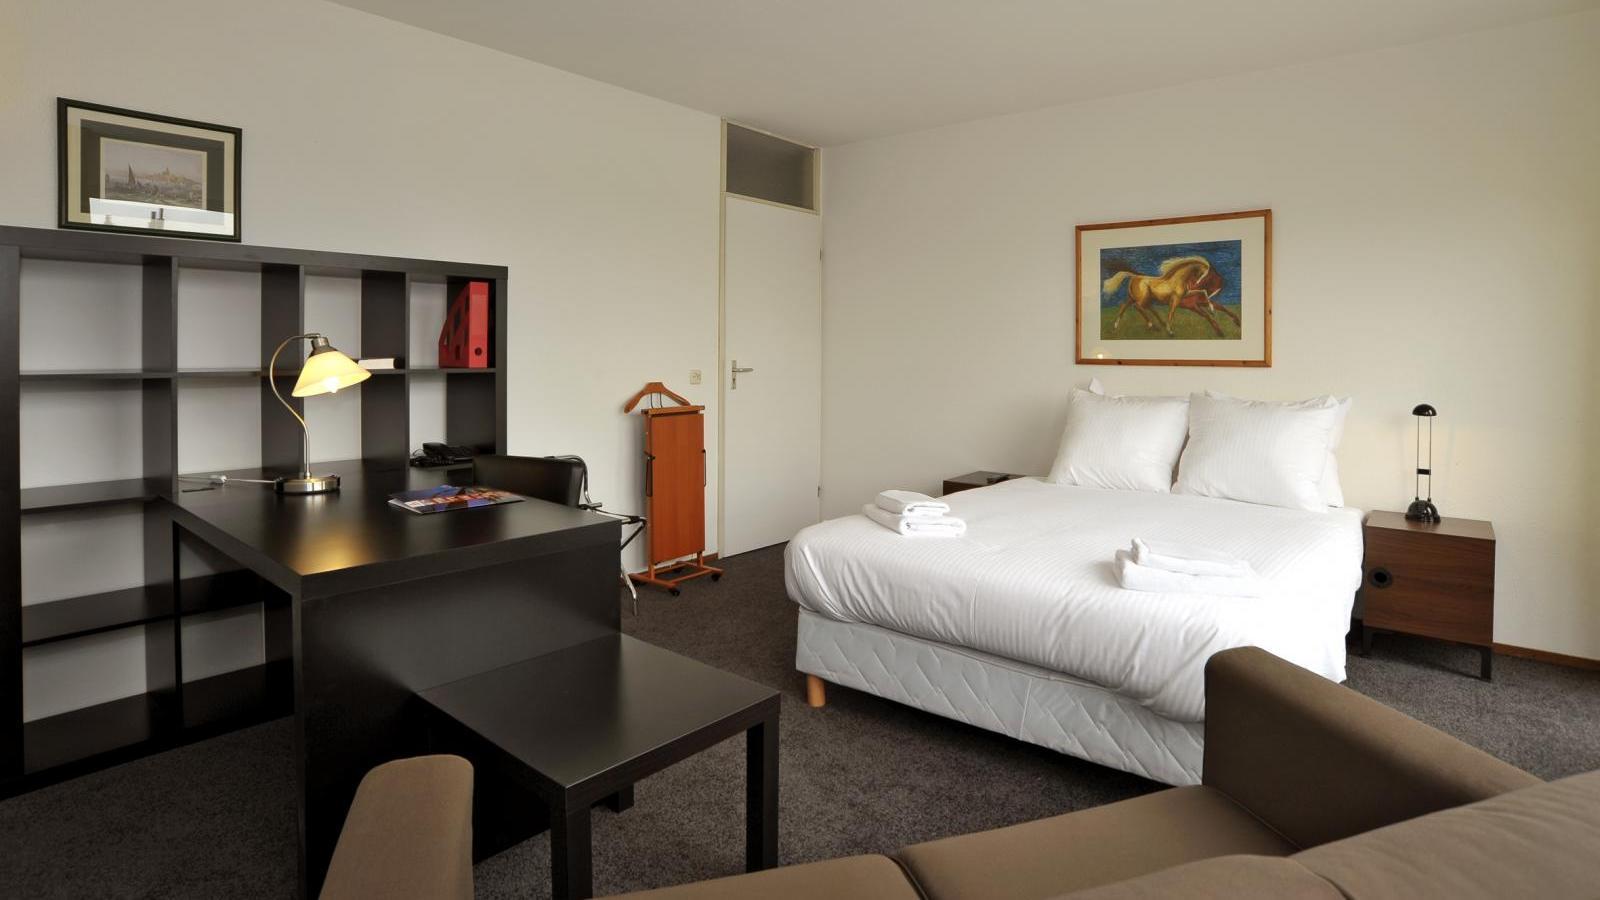 Apart Hotel Randwyck, Maastricht - Family Kamer